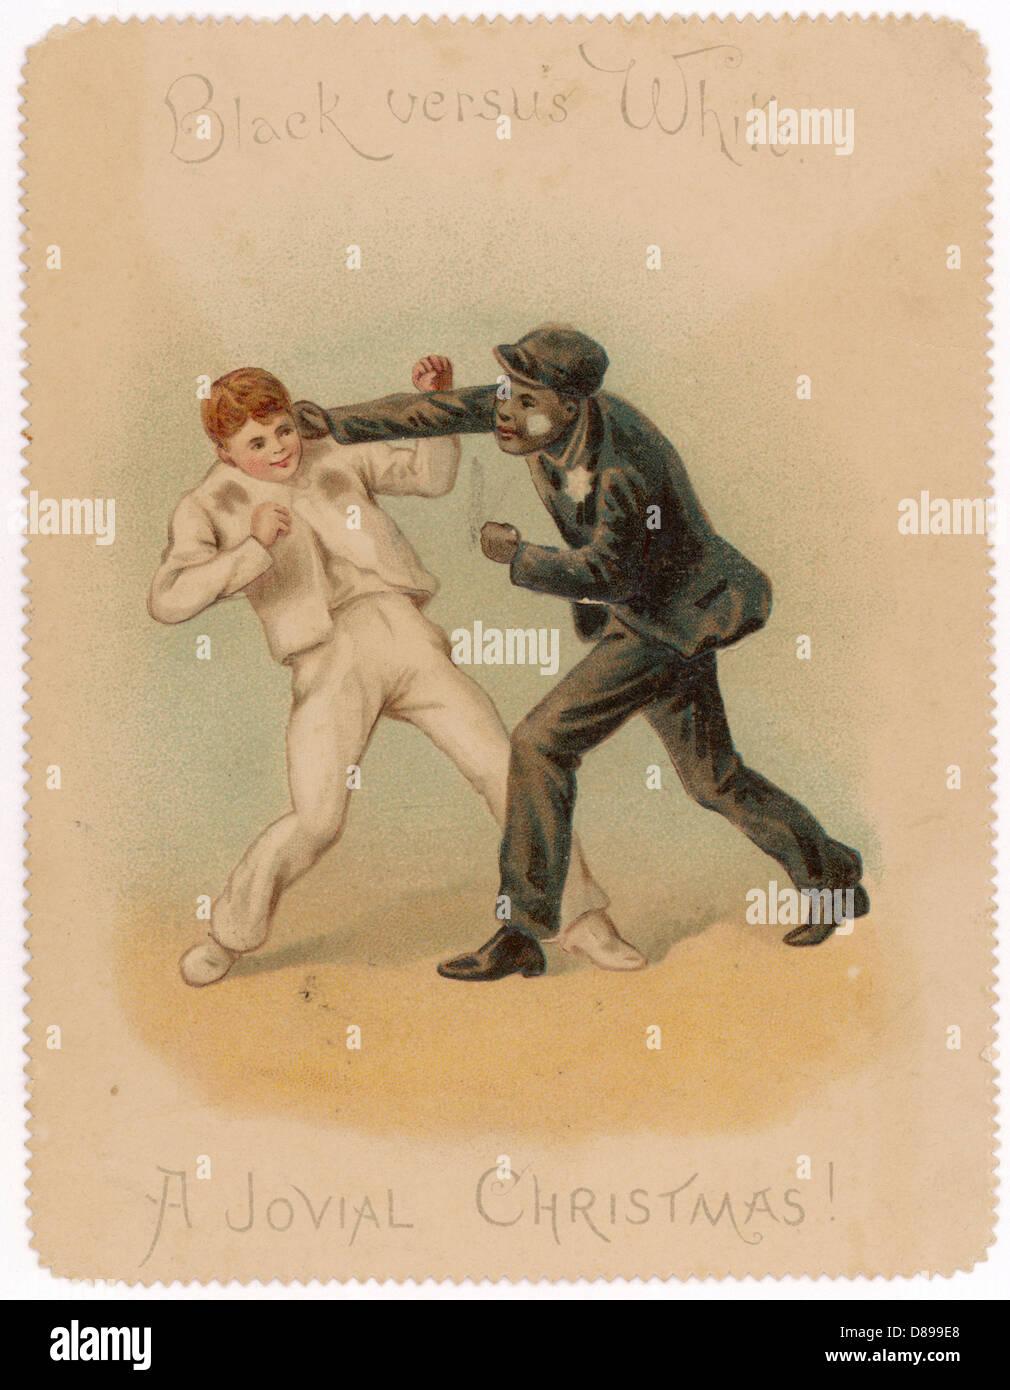 Black White Boy Fight - Stock Image